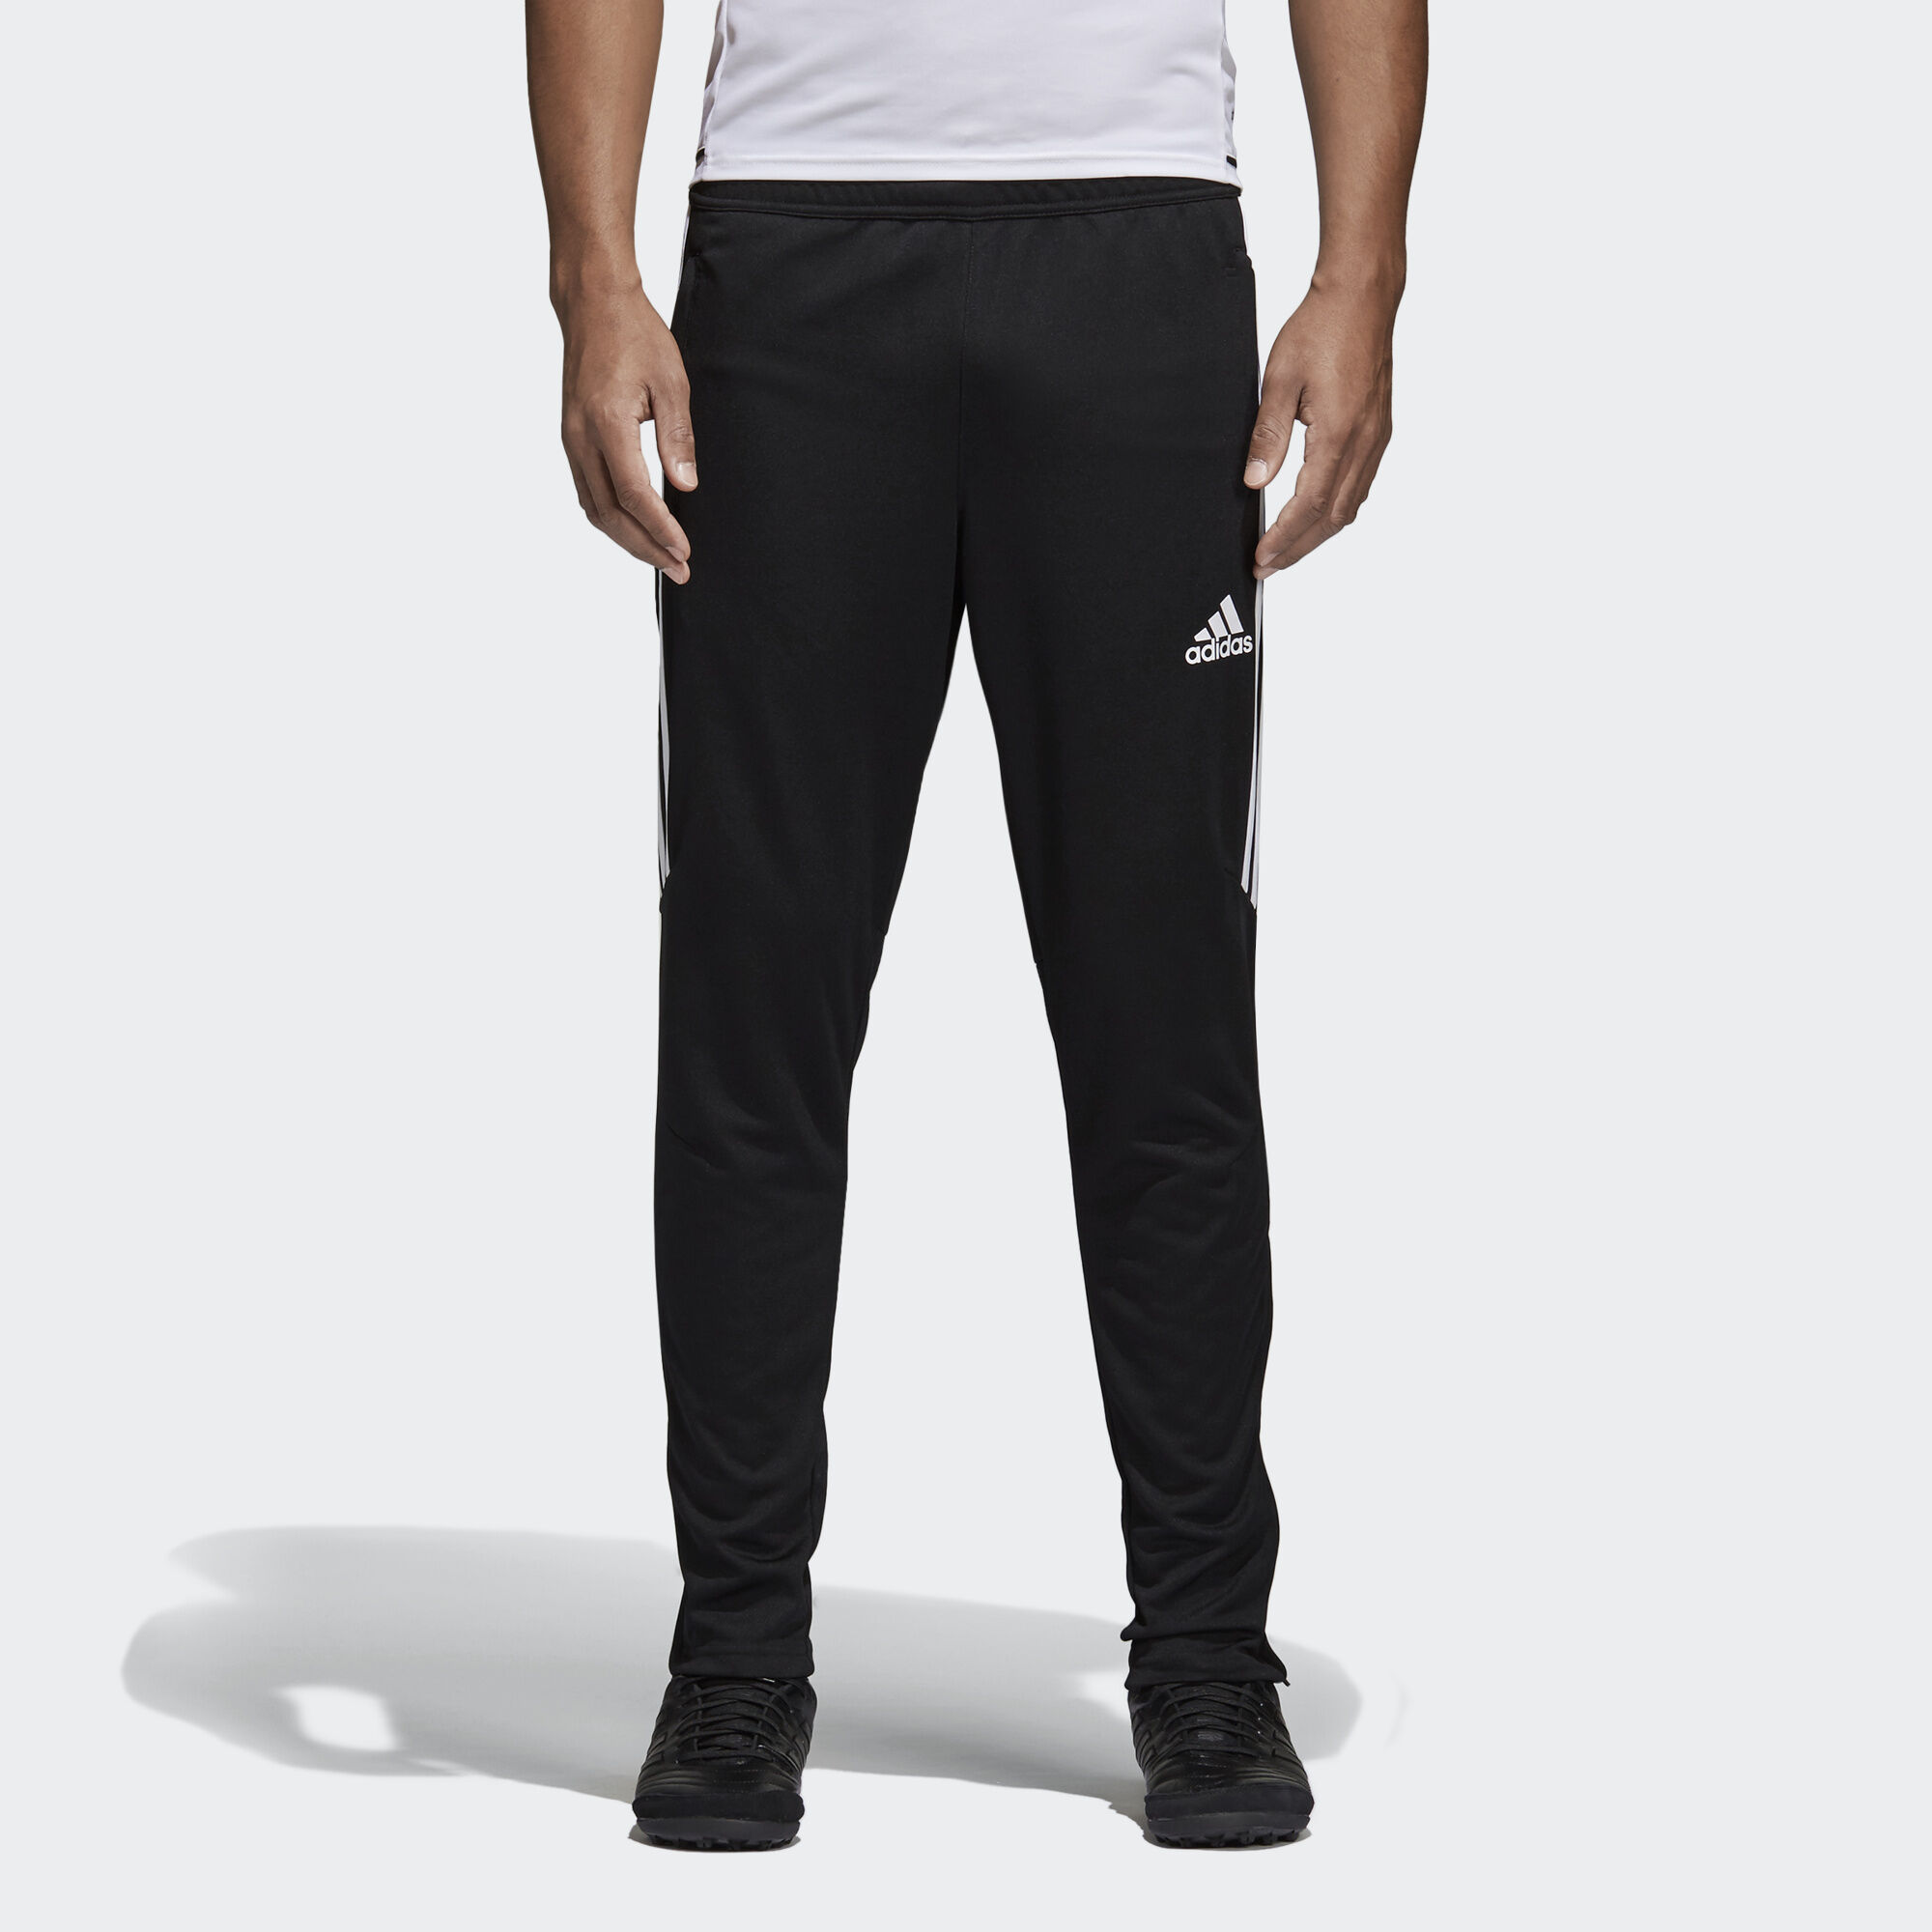 Adidas 2017 Homme Football